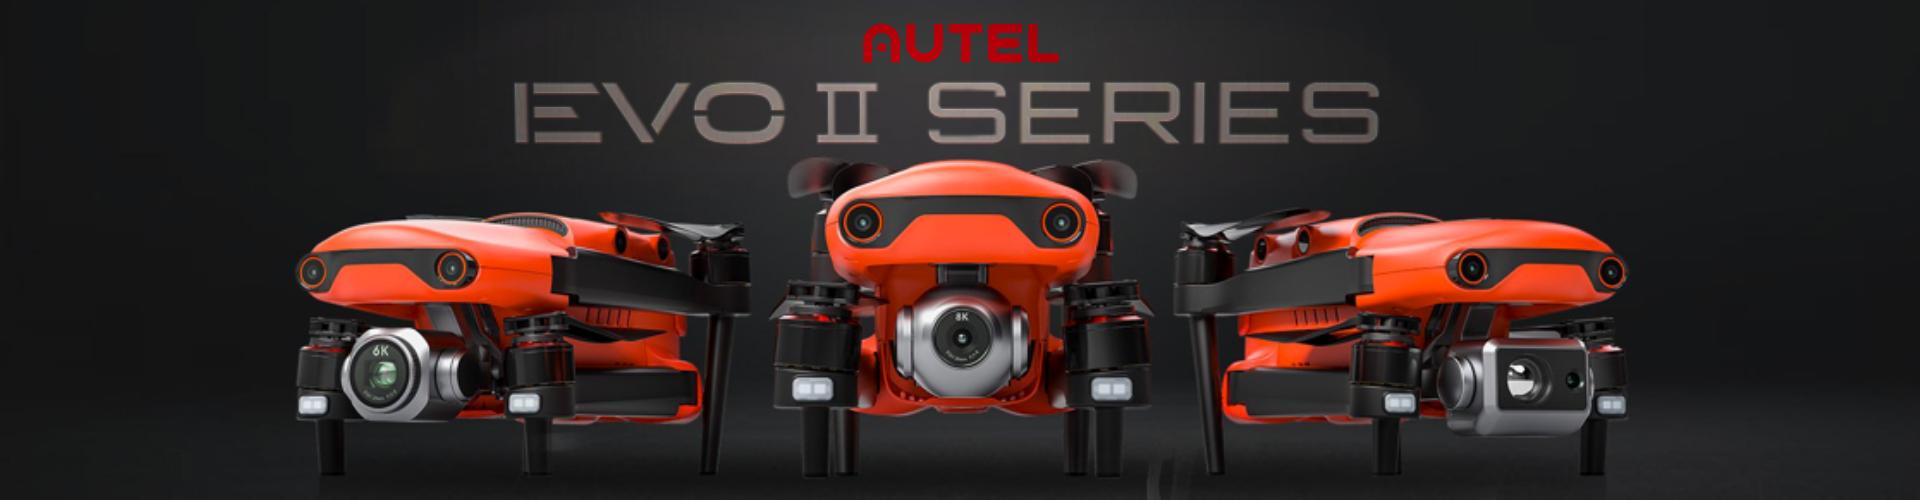 PRODUCTOS AUTEL DRONEVAL